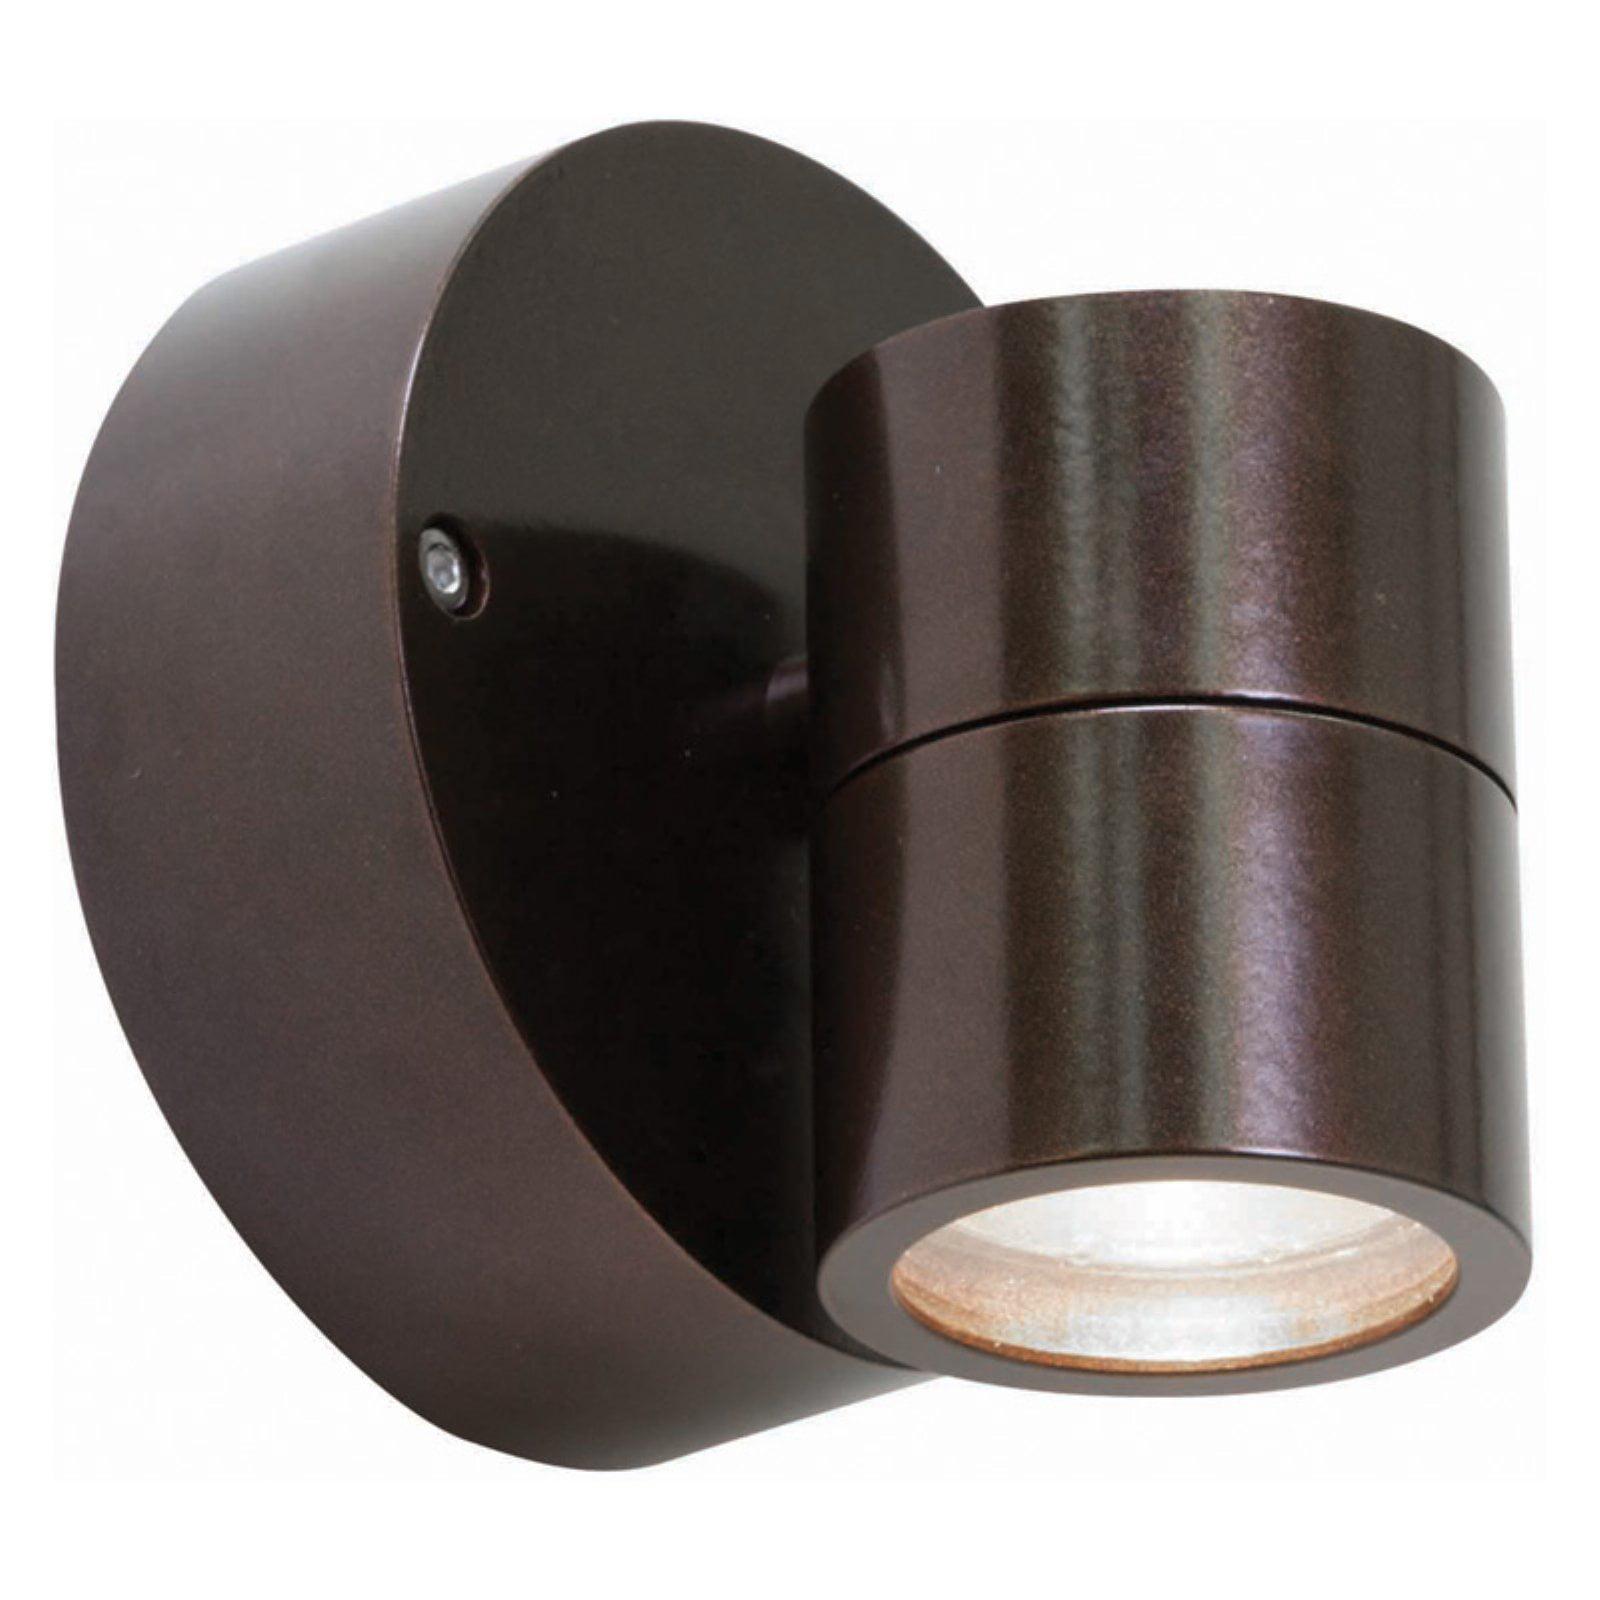 Access Lighting Ko Wall Light - 4.25H in.